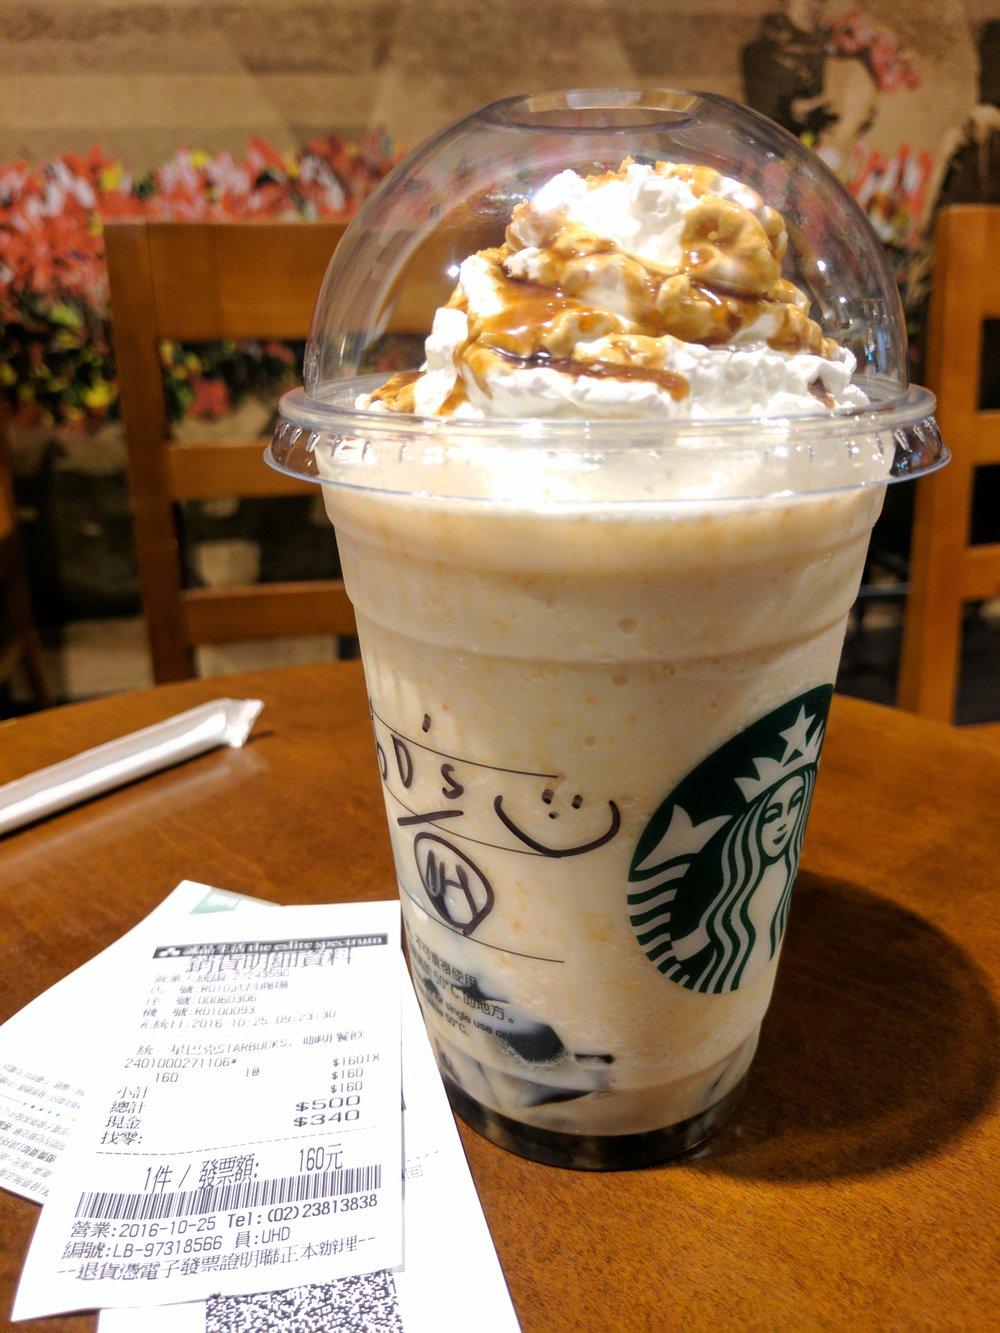 peanut frappuccino with grass jelly! also yum!